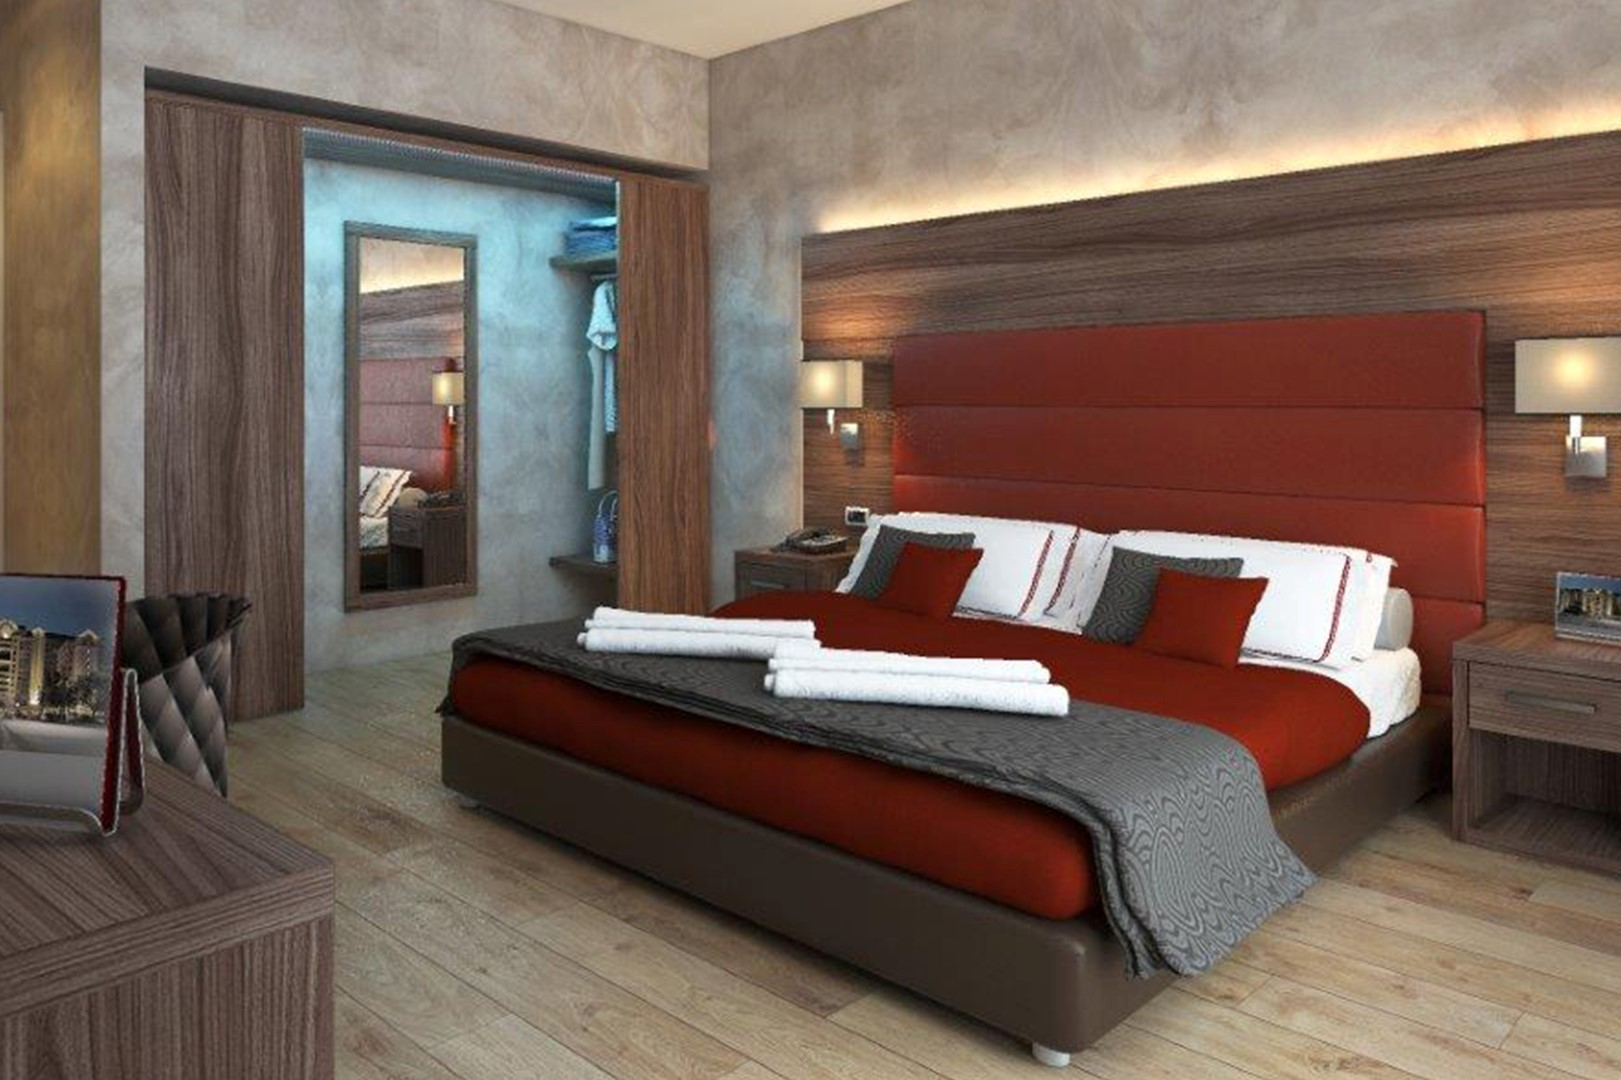 furniture_0009_2.double room_hotel furniture (19)